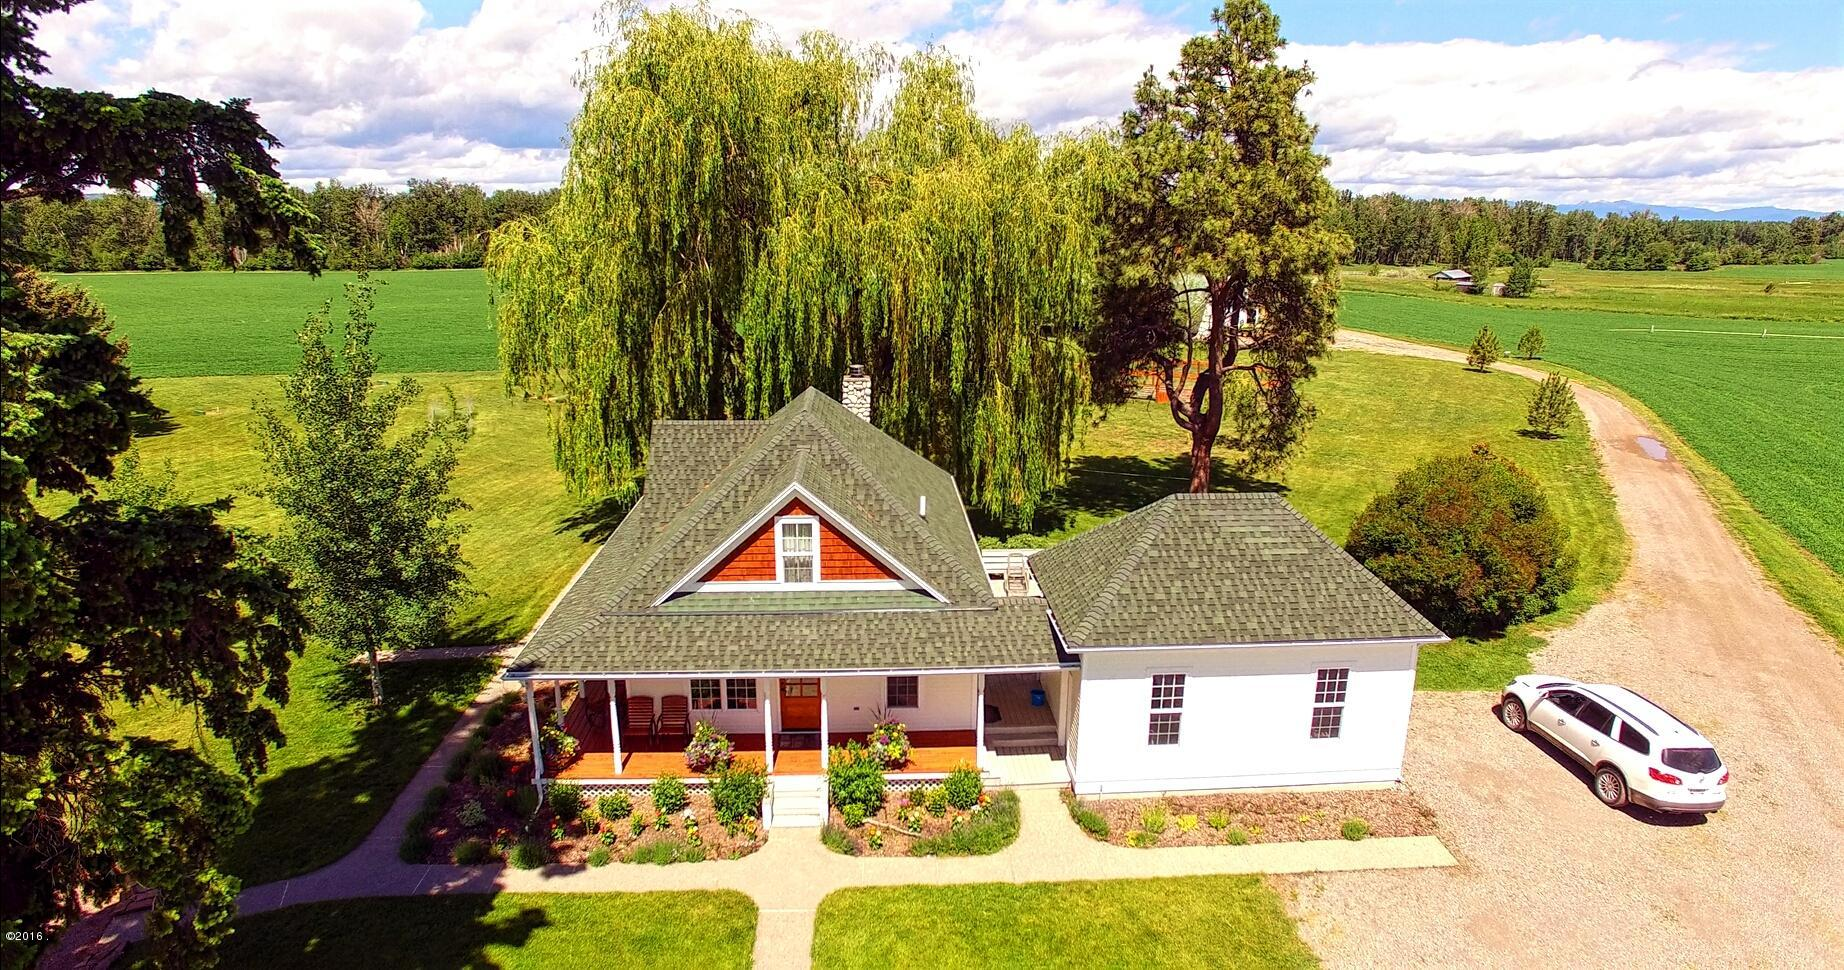 1512 Steel Bridge Road, Kalispell, 59901, MLS # 21902270 | Berkshire  Hathaway HomeServices Montana Properties